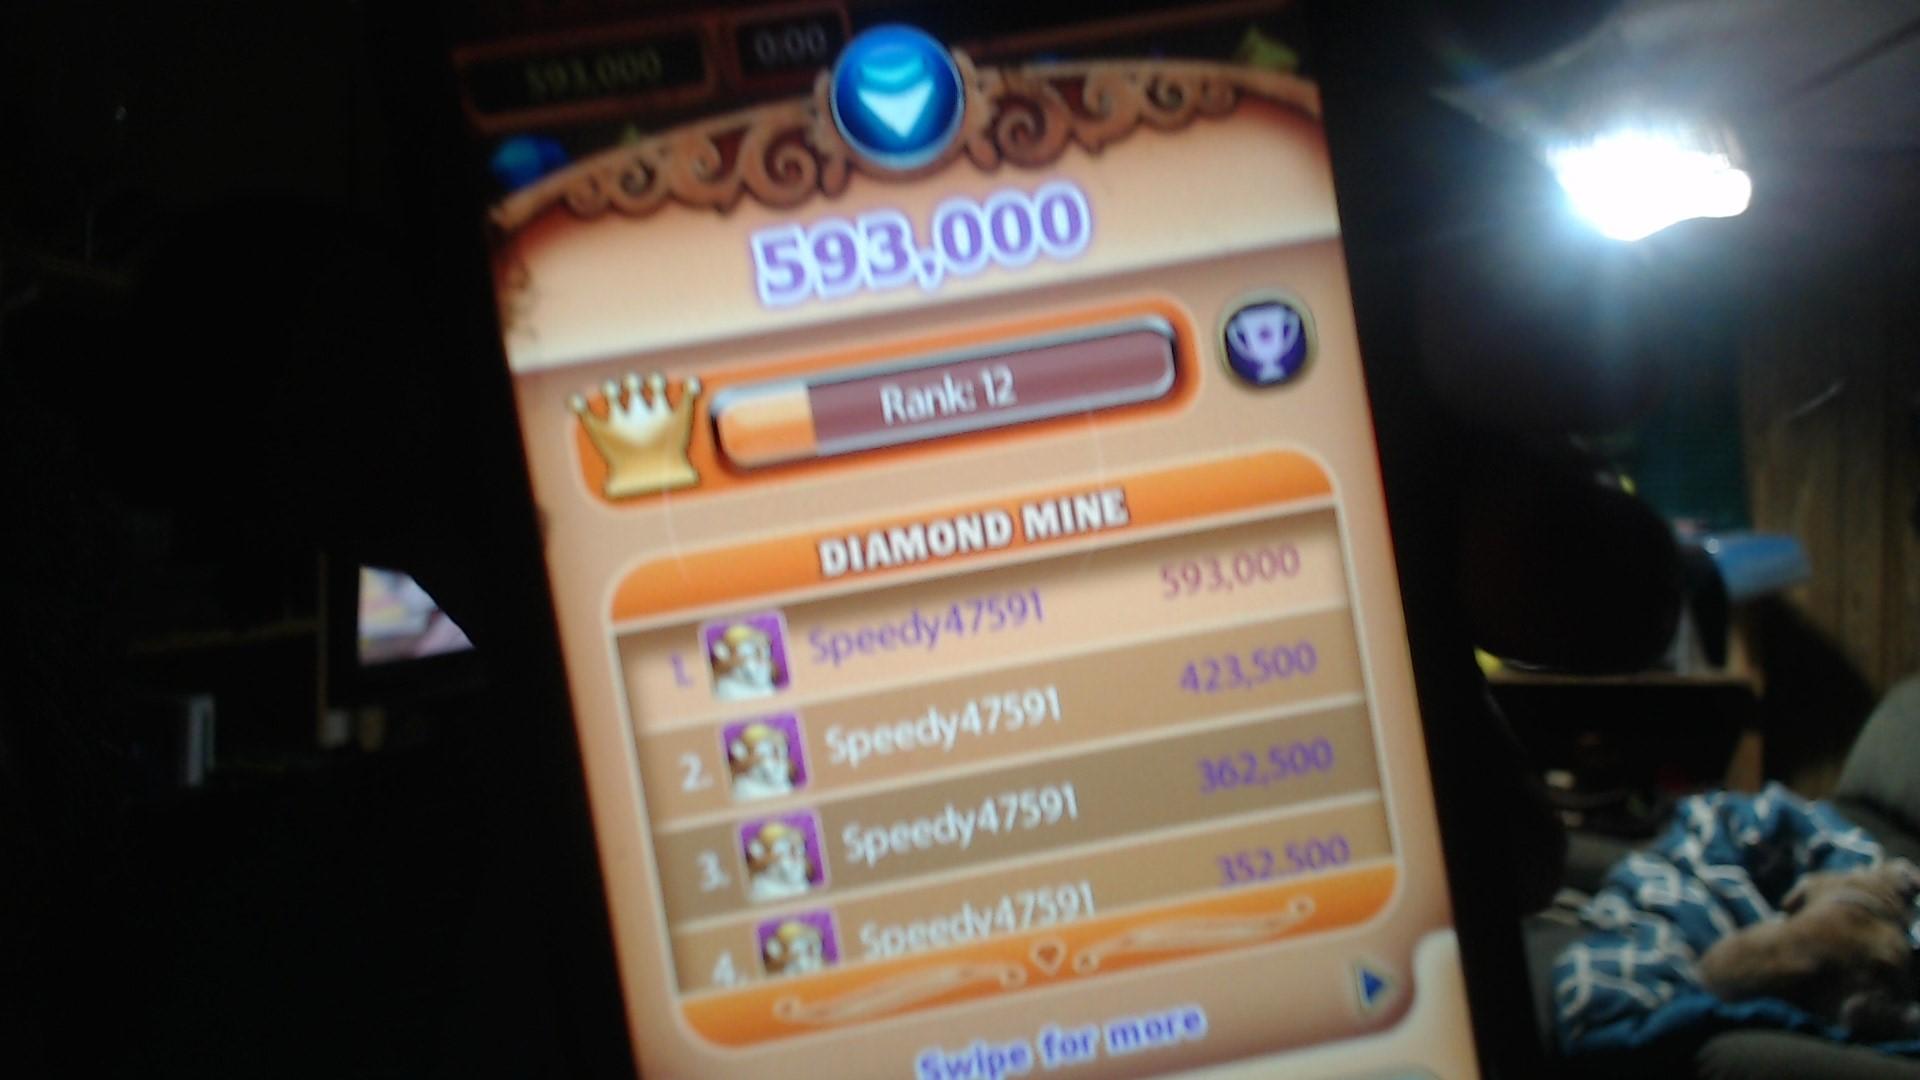 speedy4759123: Bejeweled HD [Diamond Mine] (iOS) 593,000 points on 2019-07-04 07:33:39